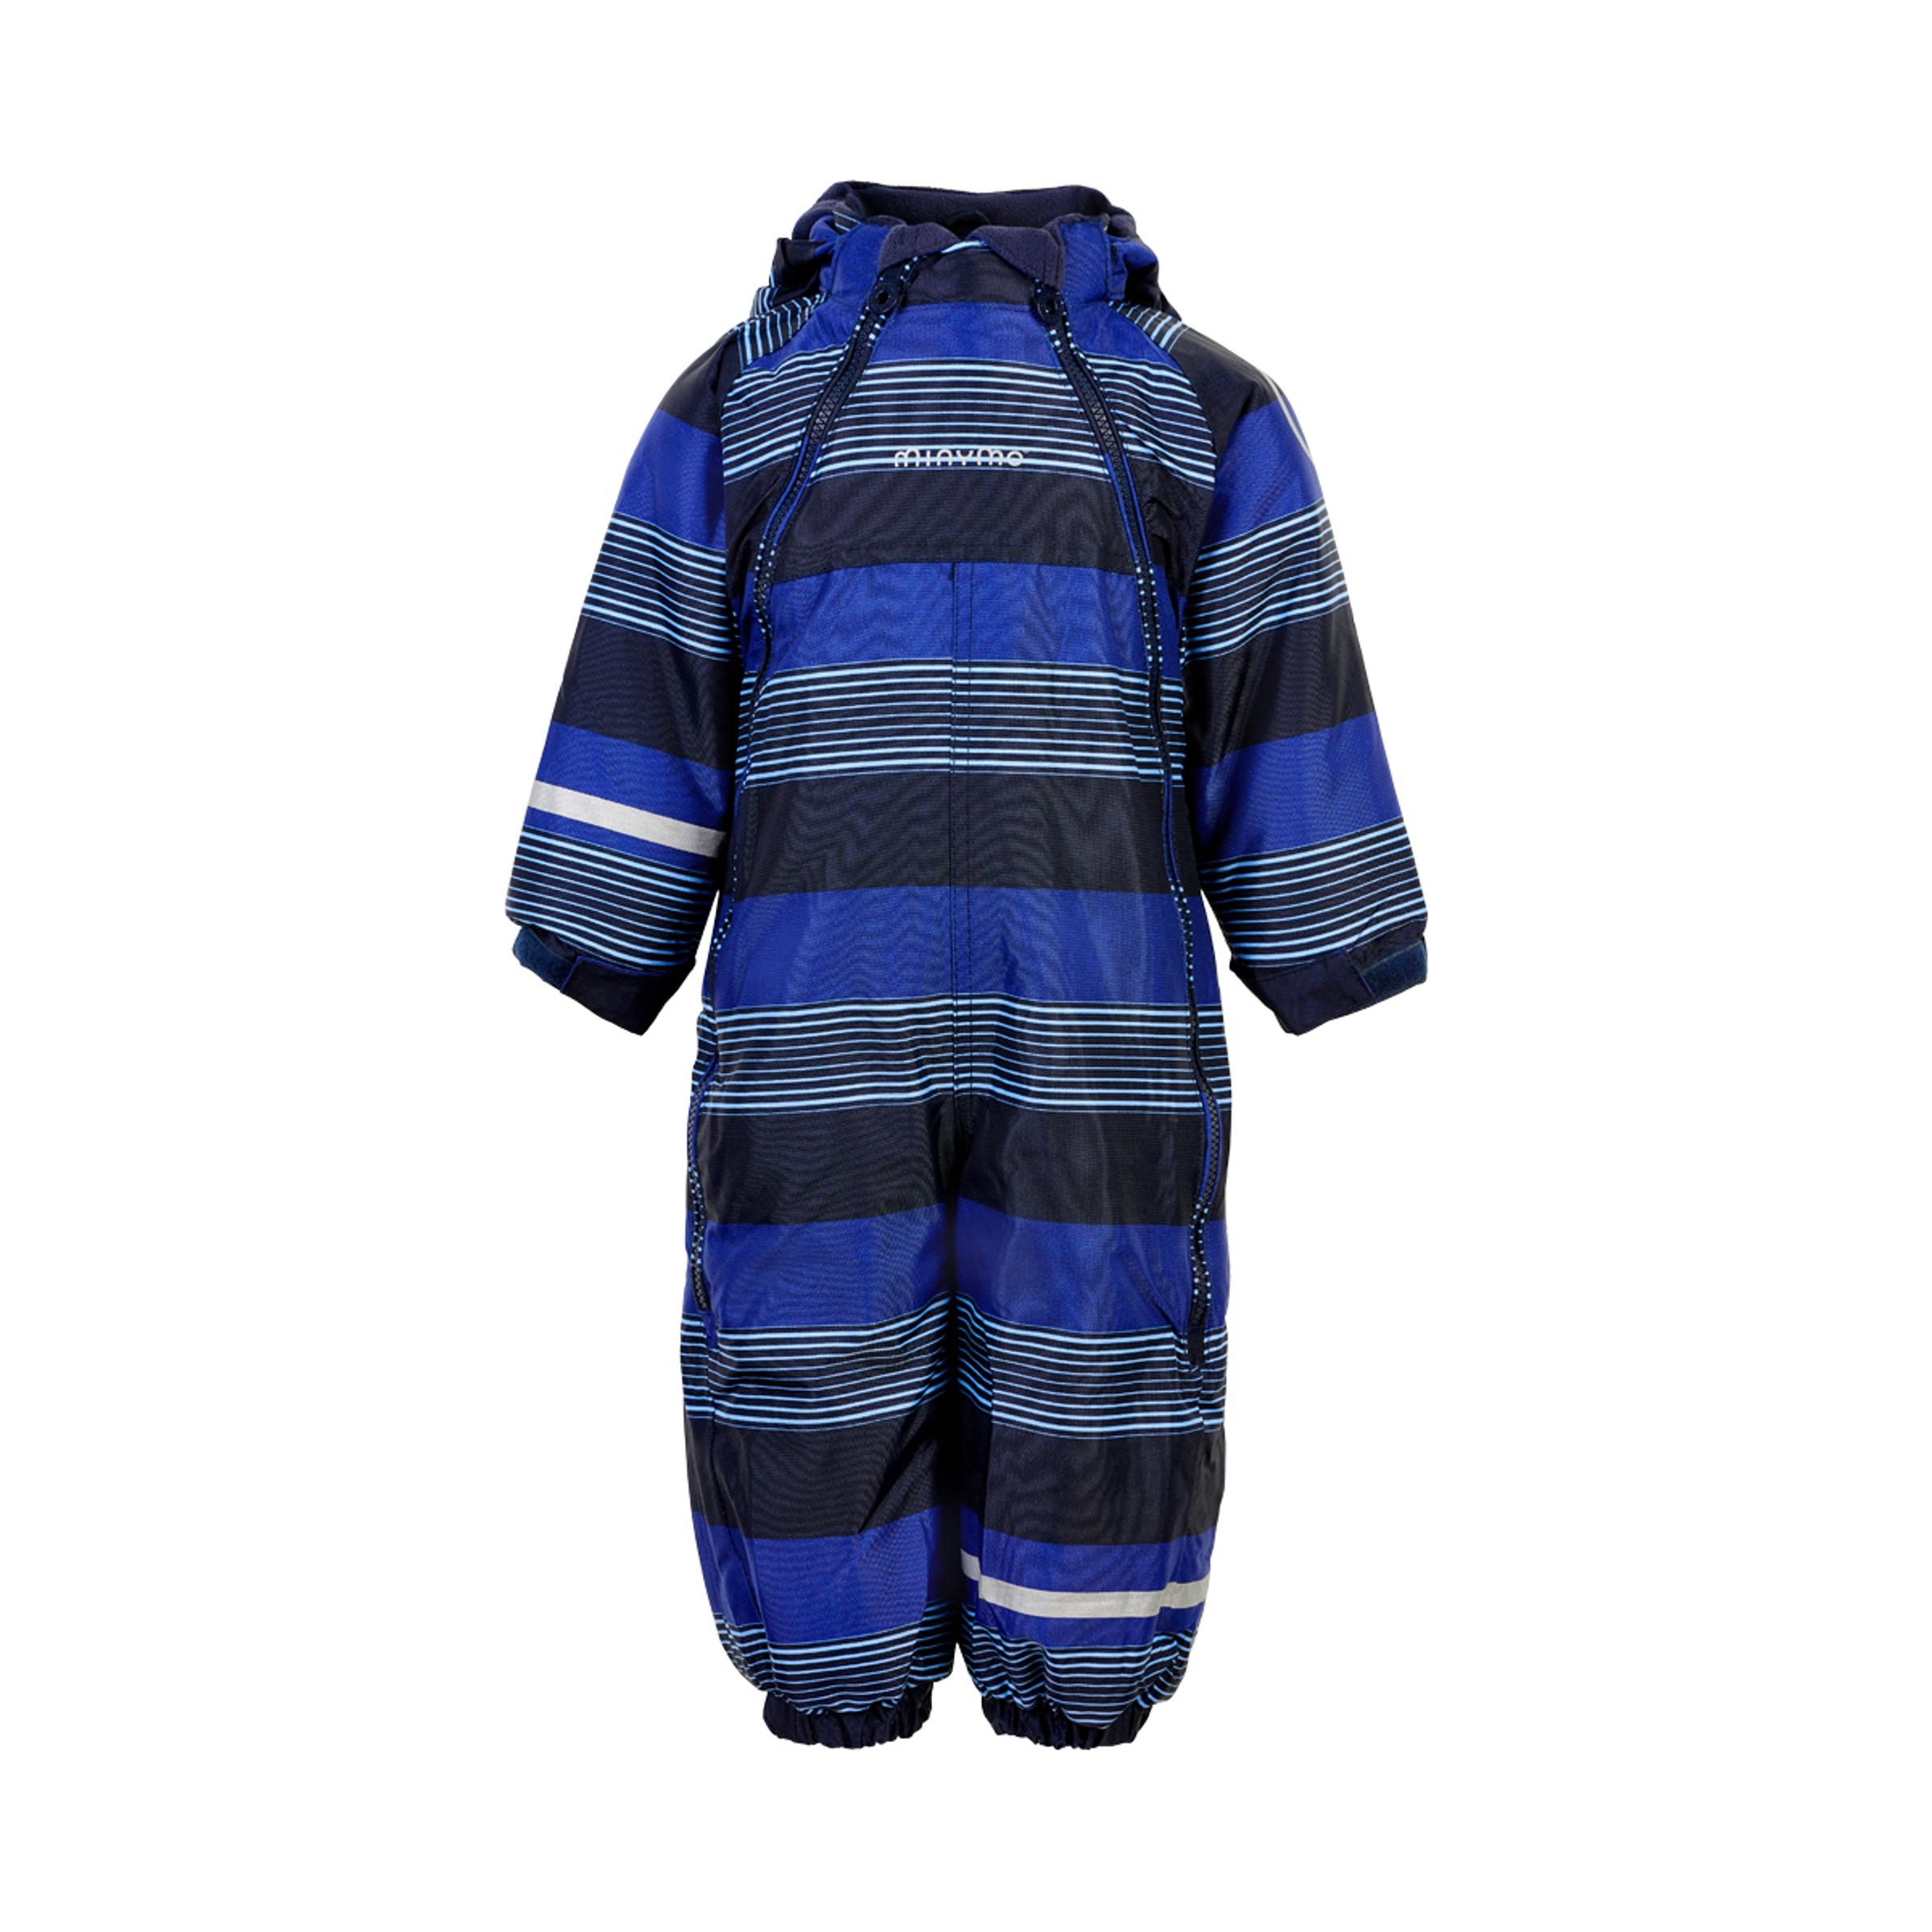 Minymo Boy Schneeanzug Oxford 2 Zipper placid blue